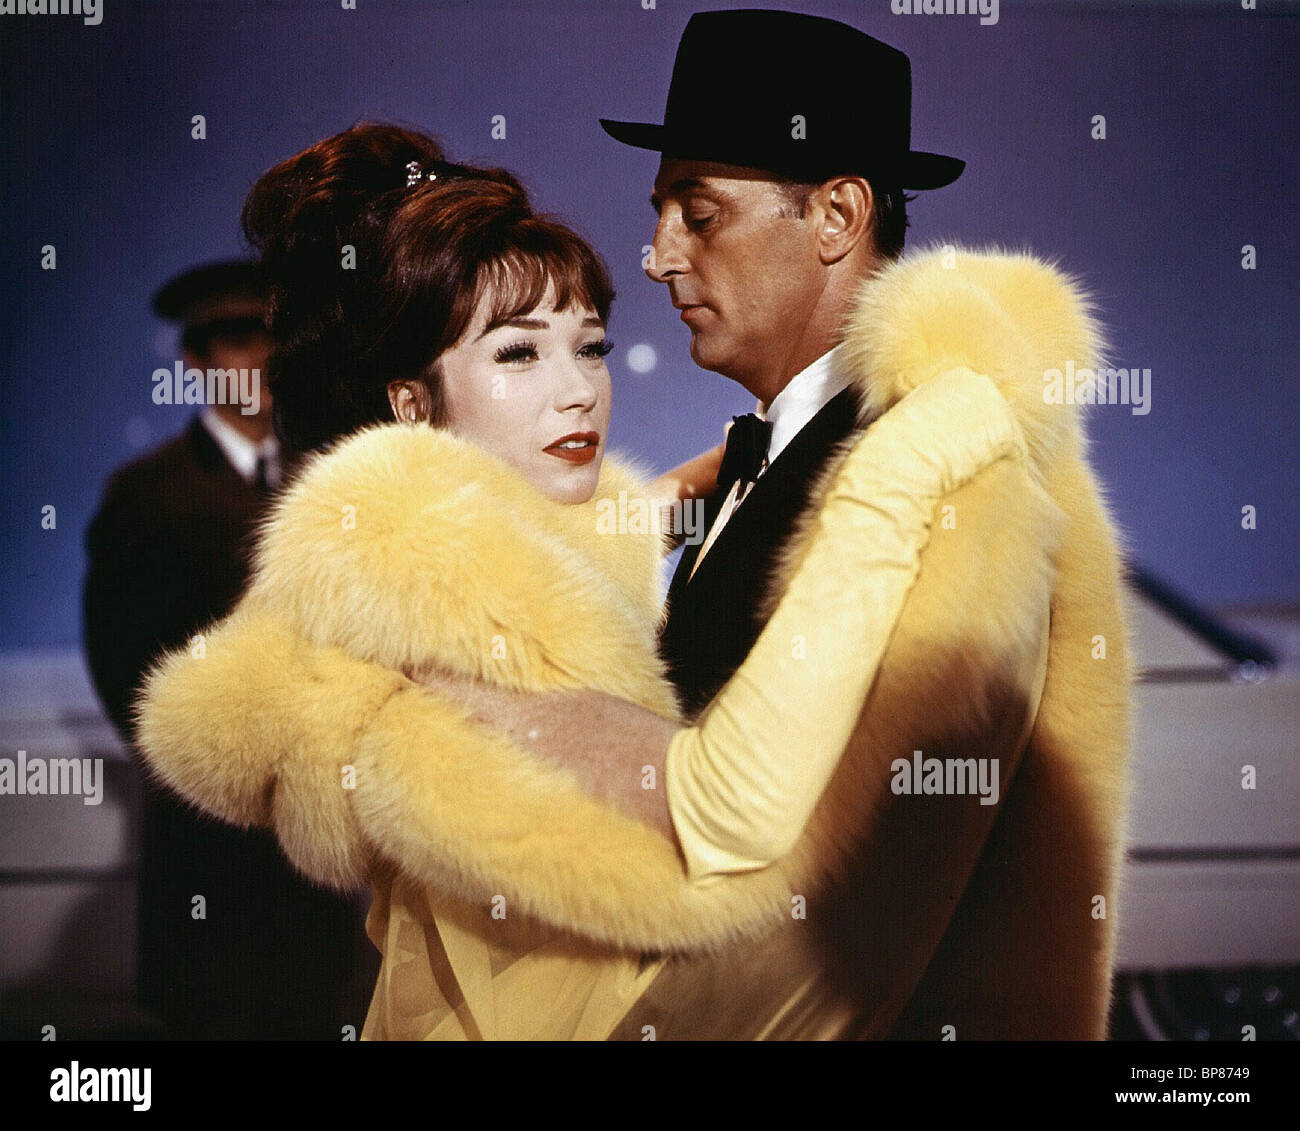 SHIRLEY MACLAINE, ROBERT MITCHUM, WHAT A WAY TO GO, 1964 ... Shirley Maclaine What A Way To Go Images